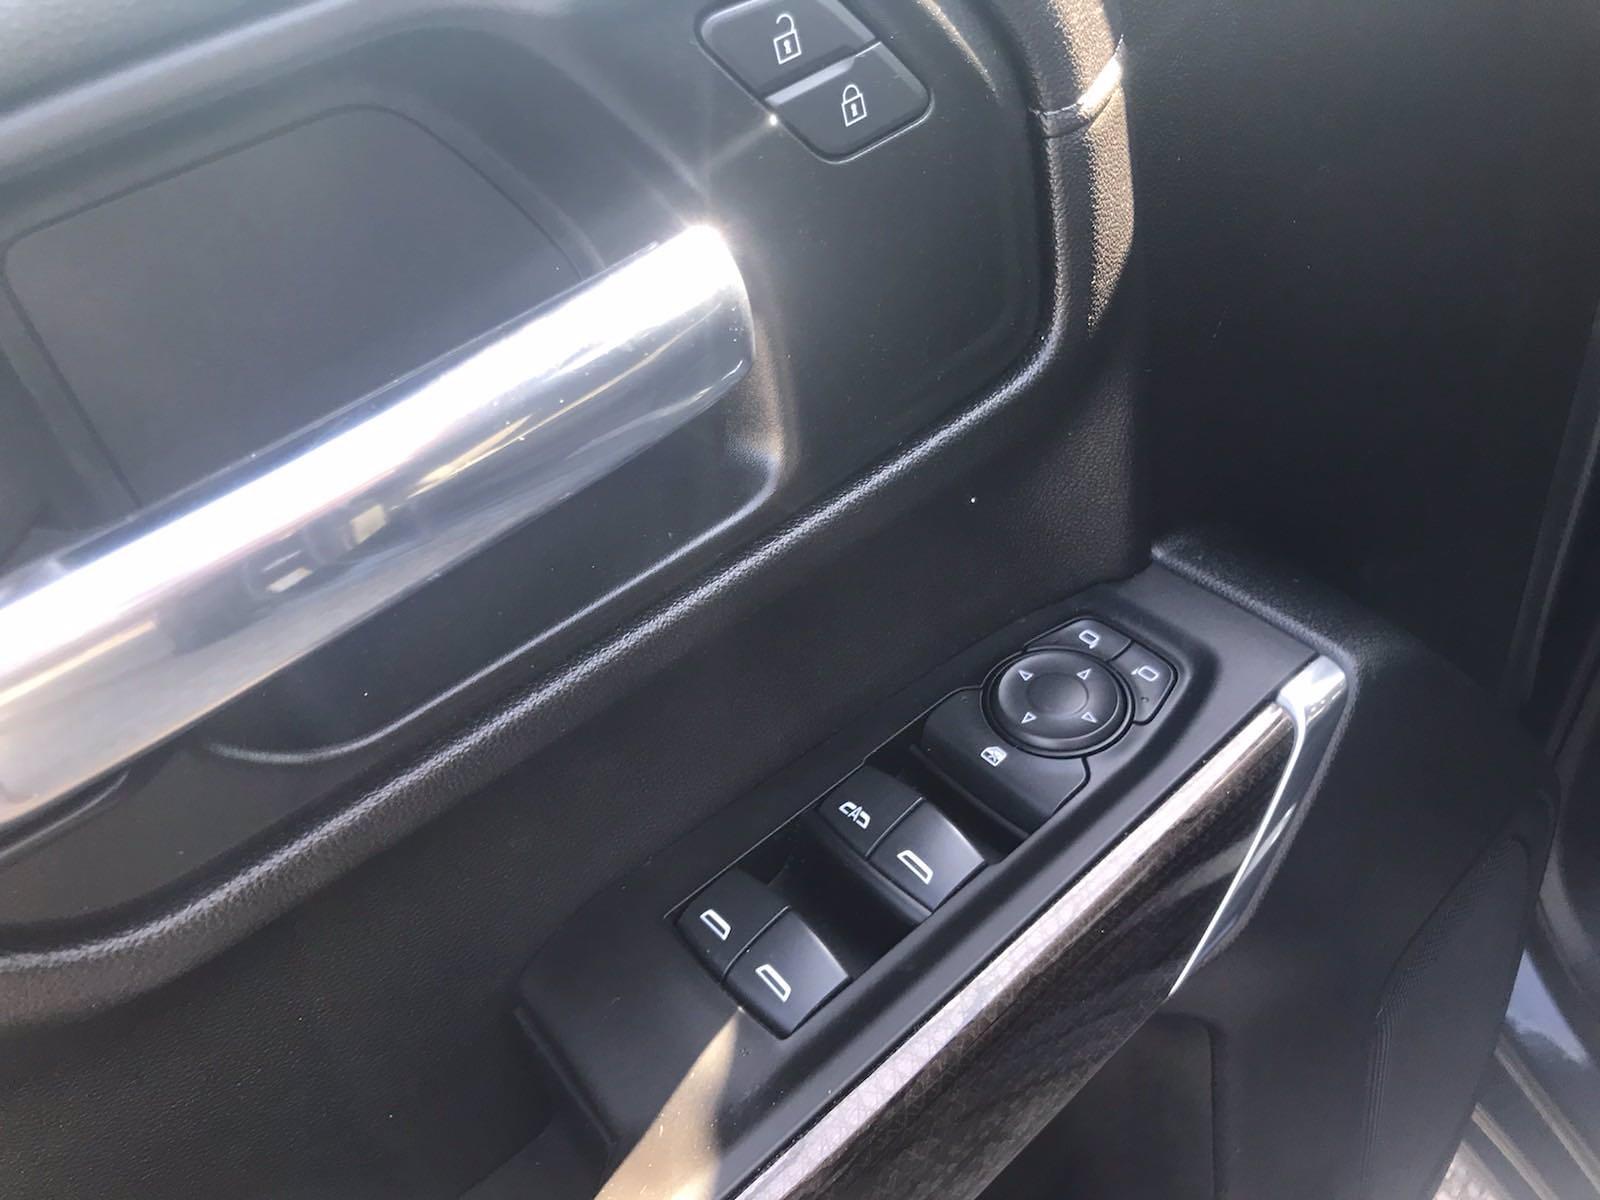 2020 Chevrolet Silverado 1500 Crew Cab 4x4, Pickup #16465P - photo 17